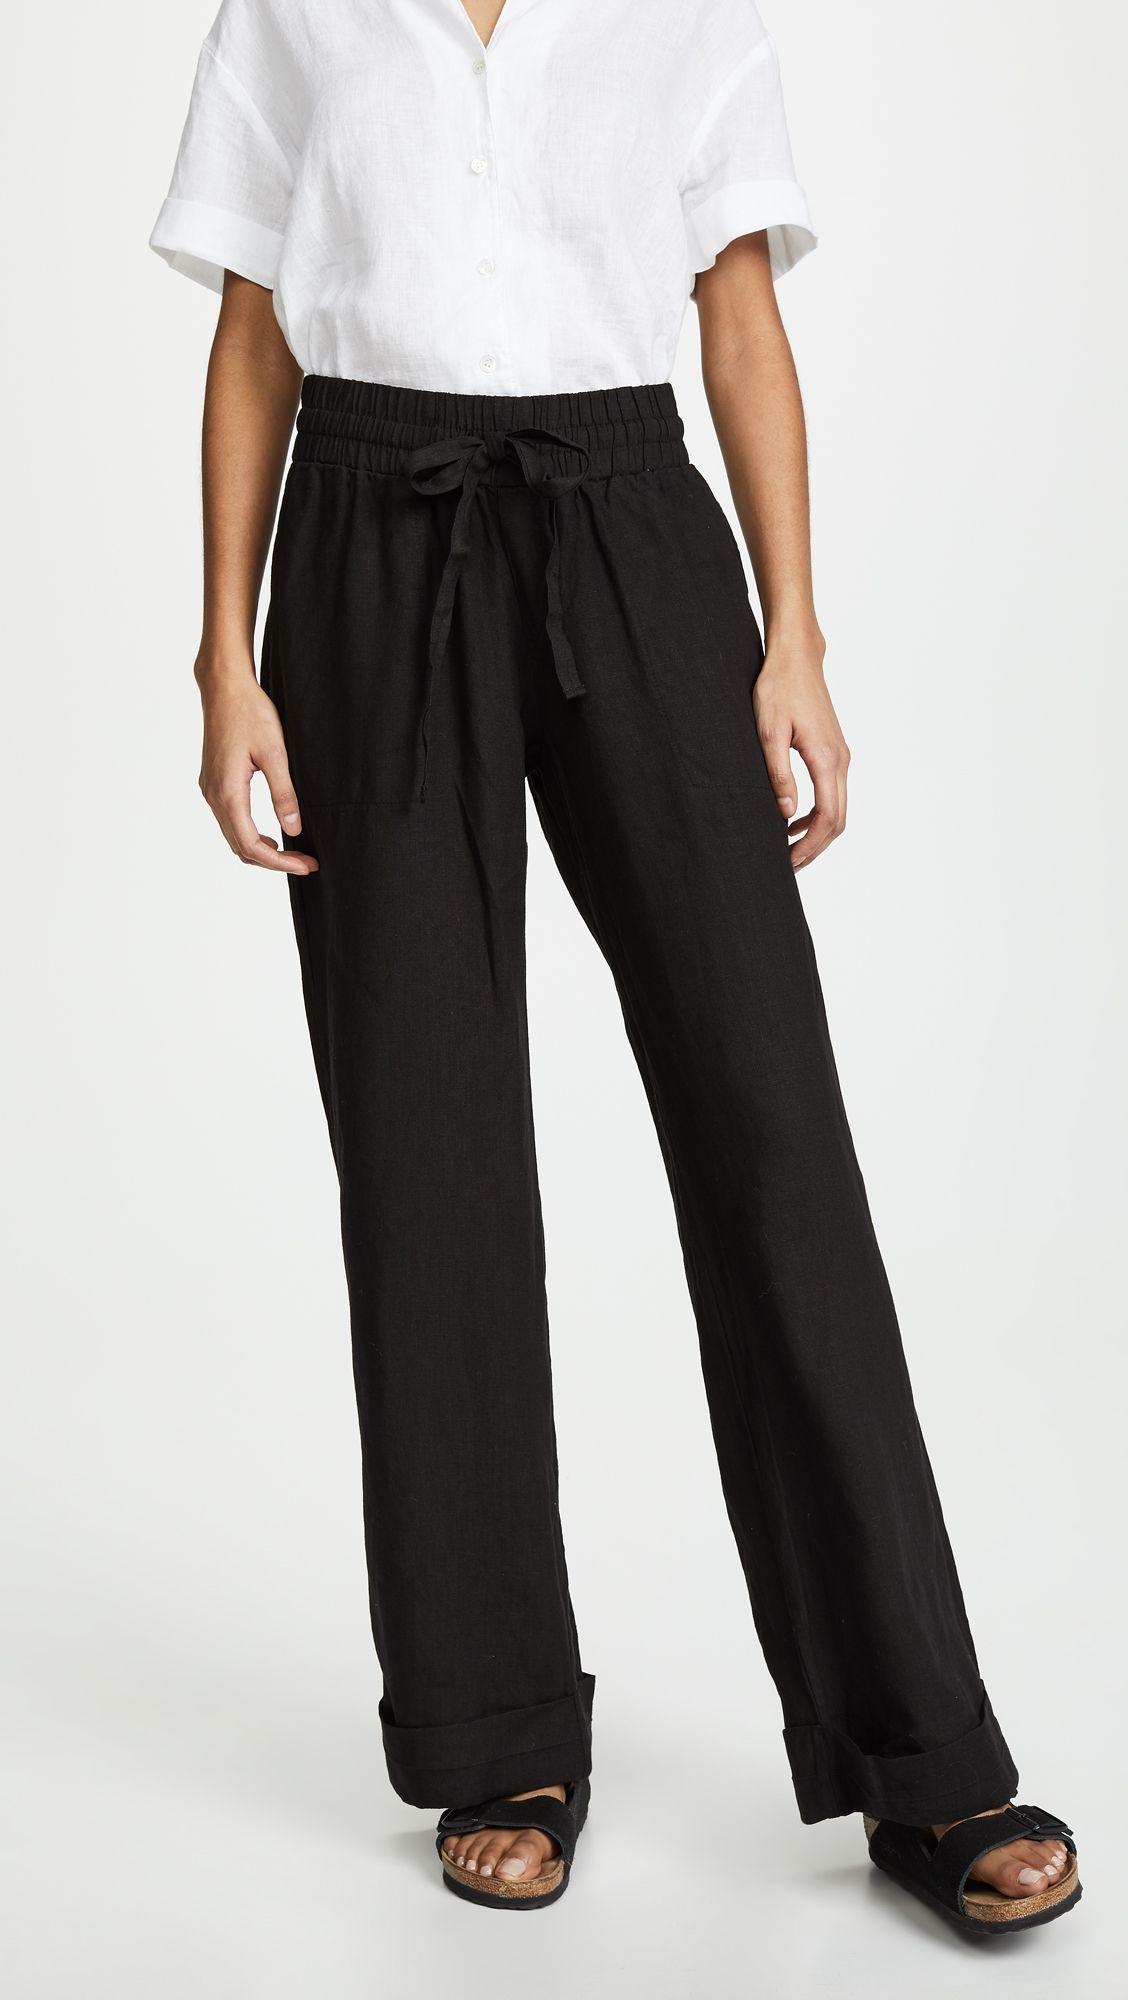 dc4bfc1df7 Cuffed Linen Beach Pants in 2019   Products   Linen beach pants ...